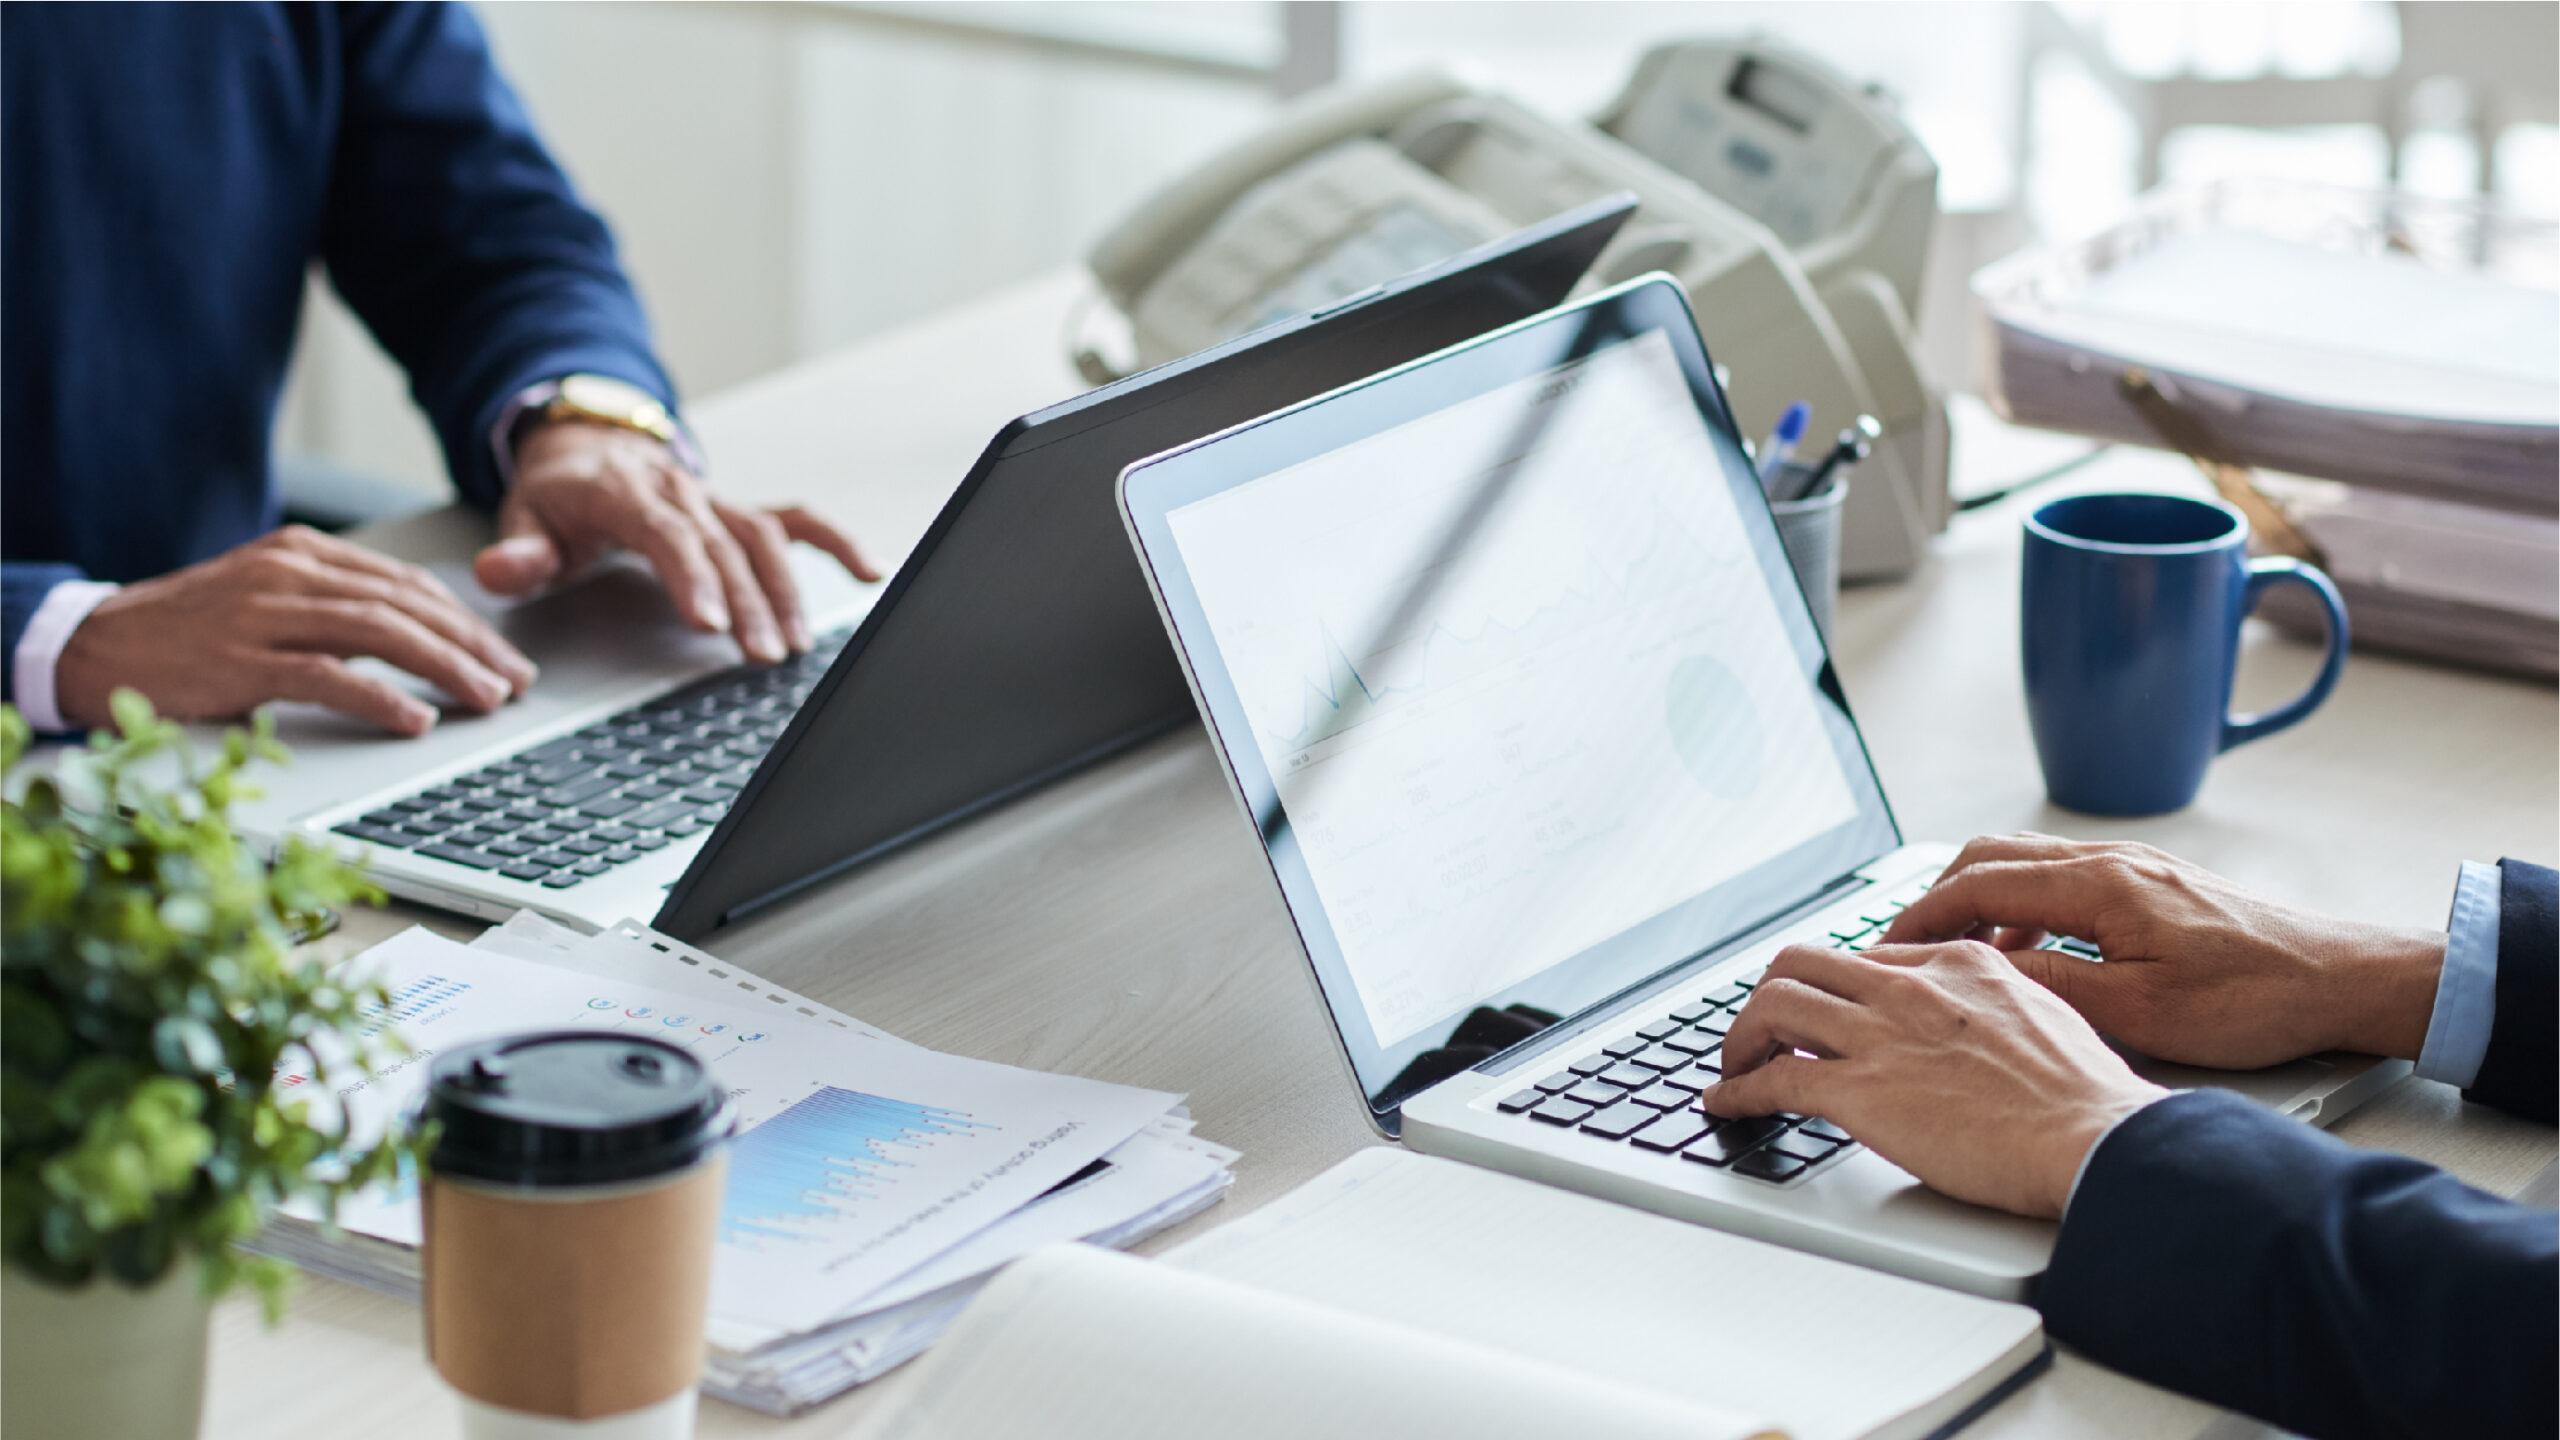 Team working on laptops